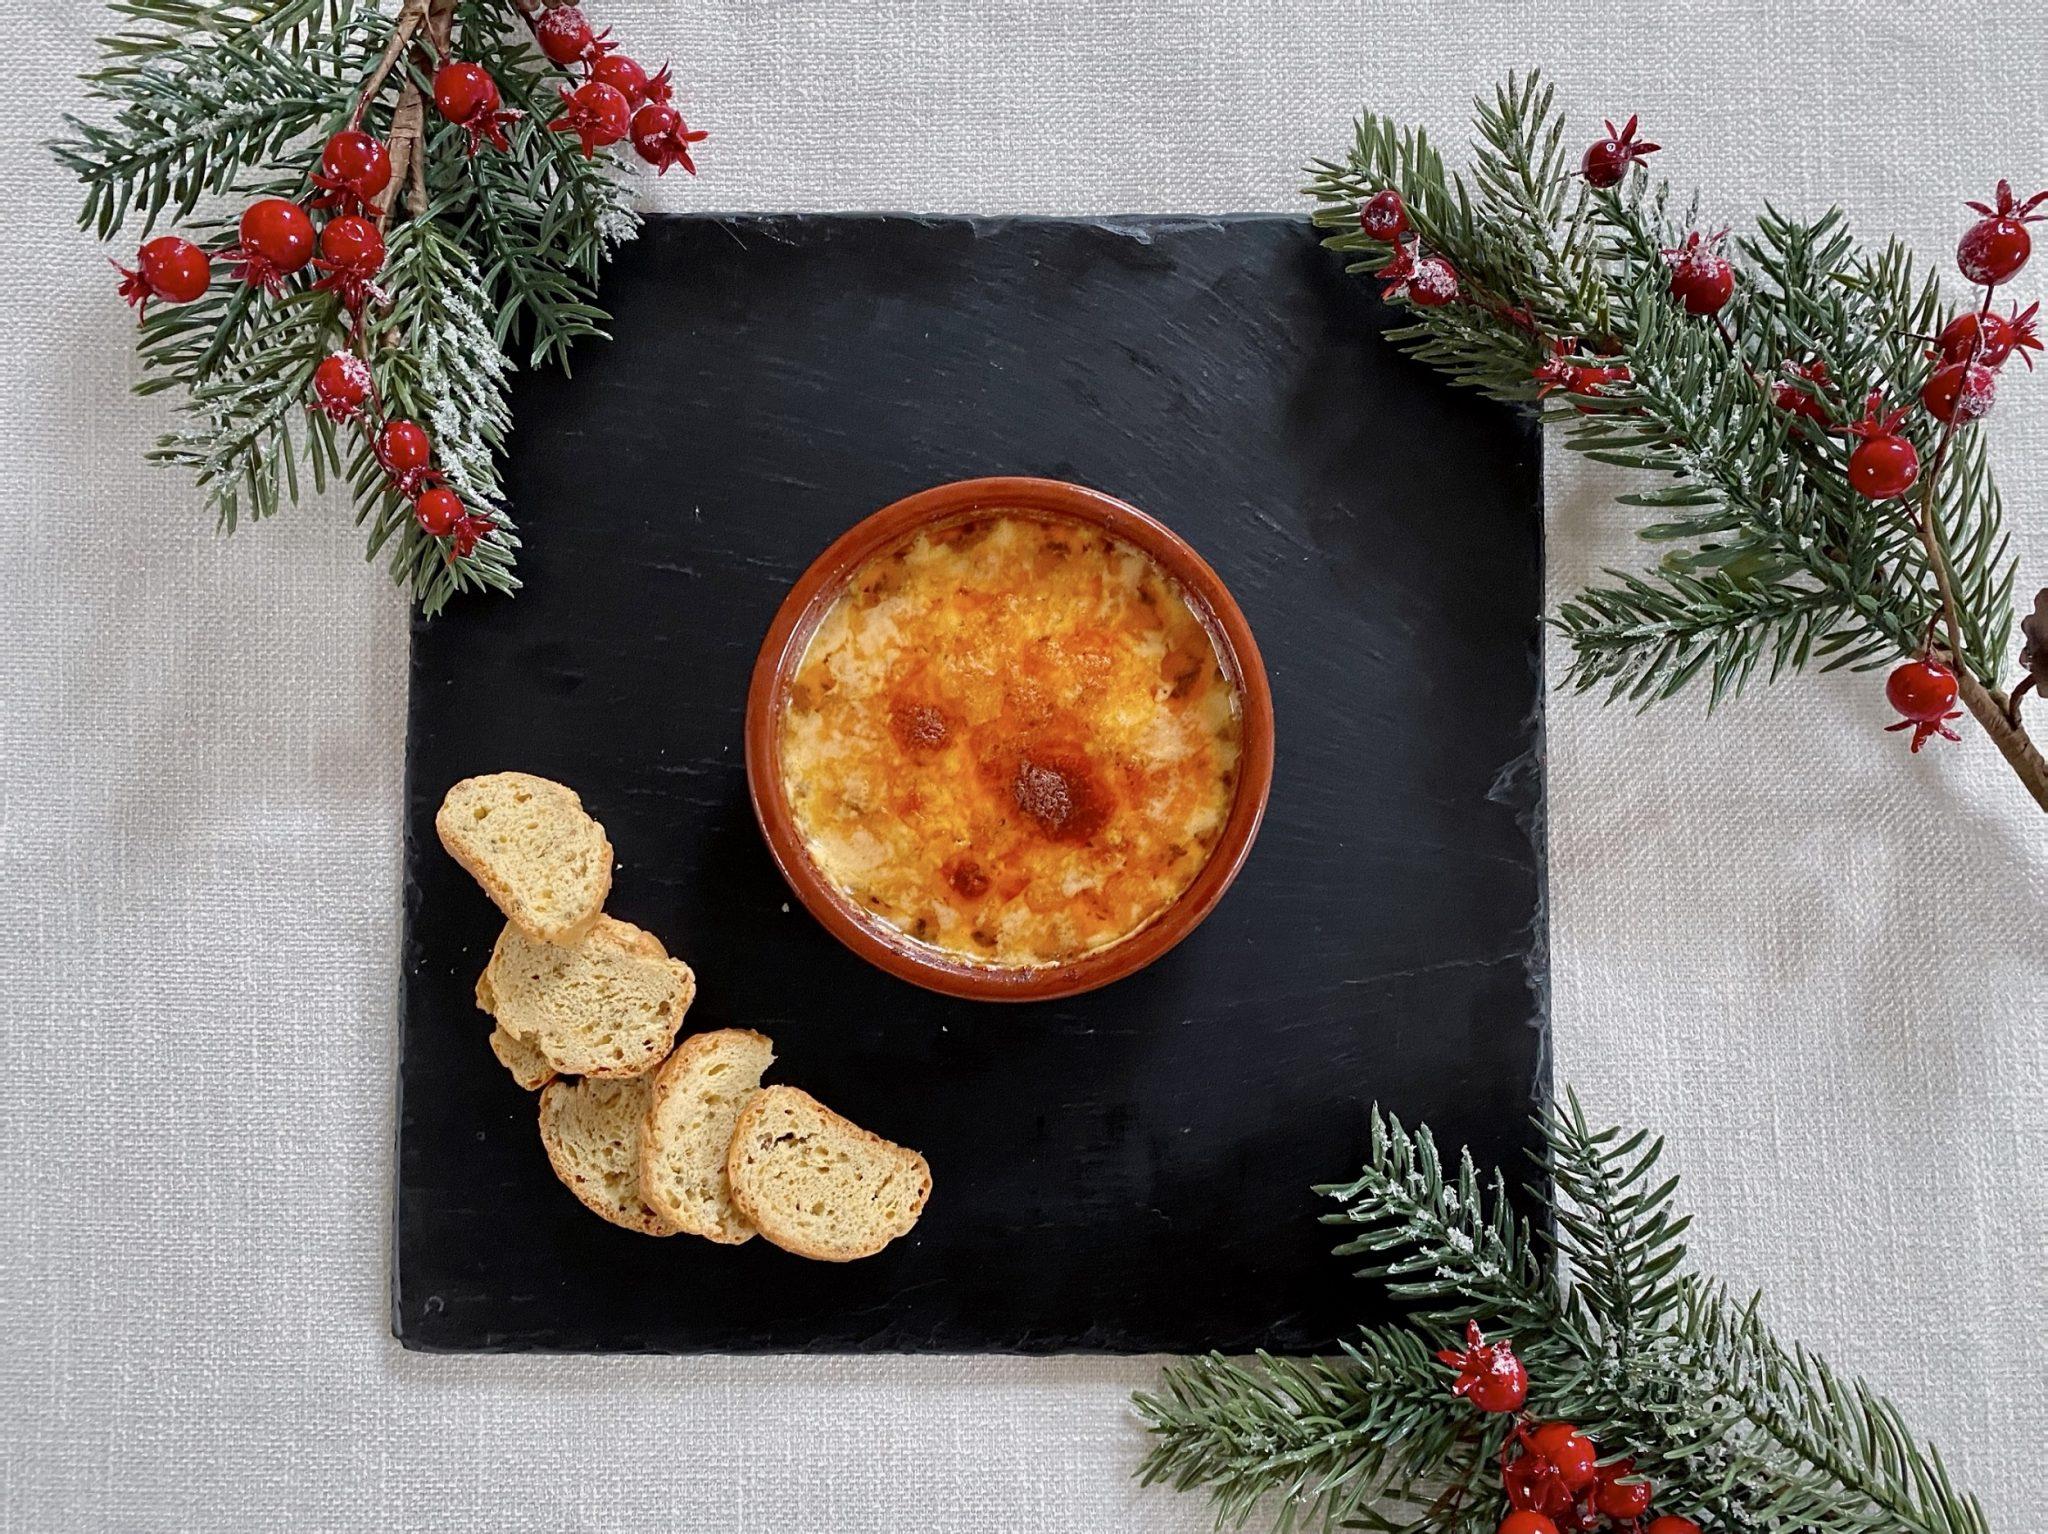 Vintage Organic Cheddar, Mozzarell and Chilli Bake